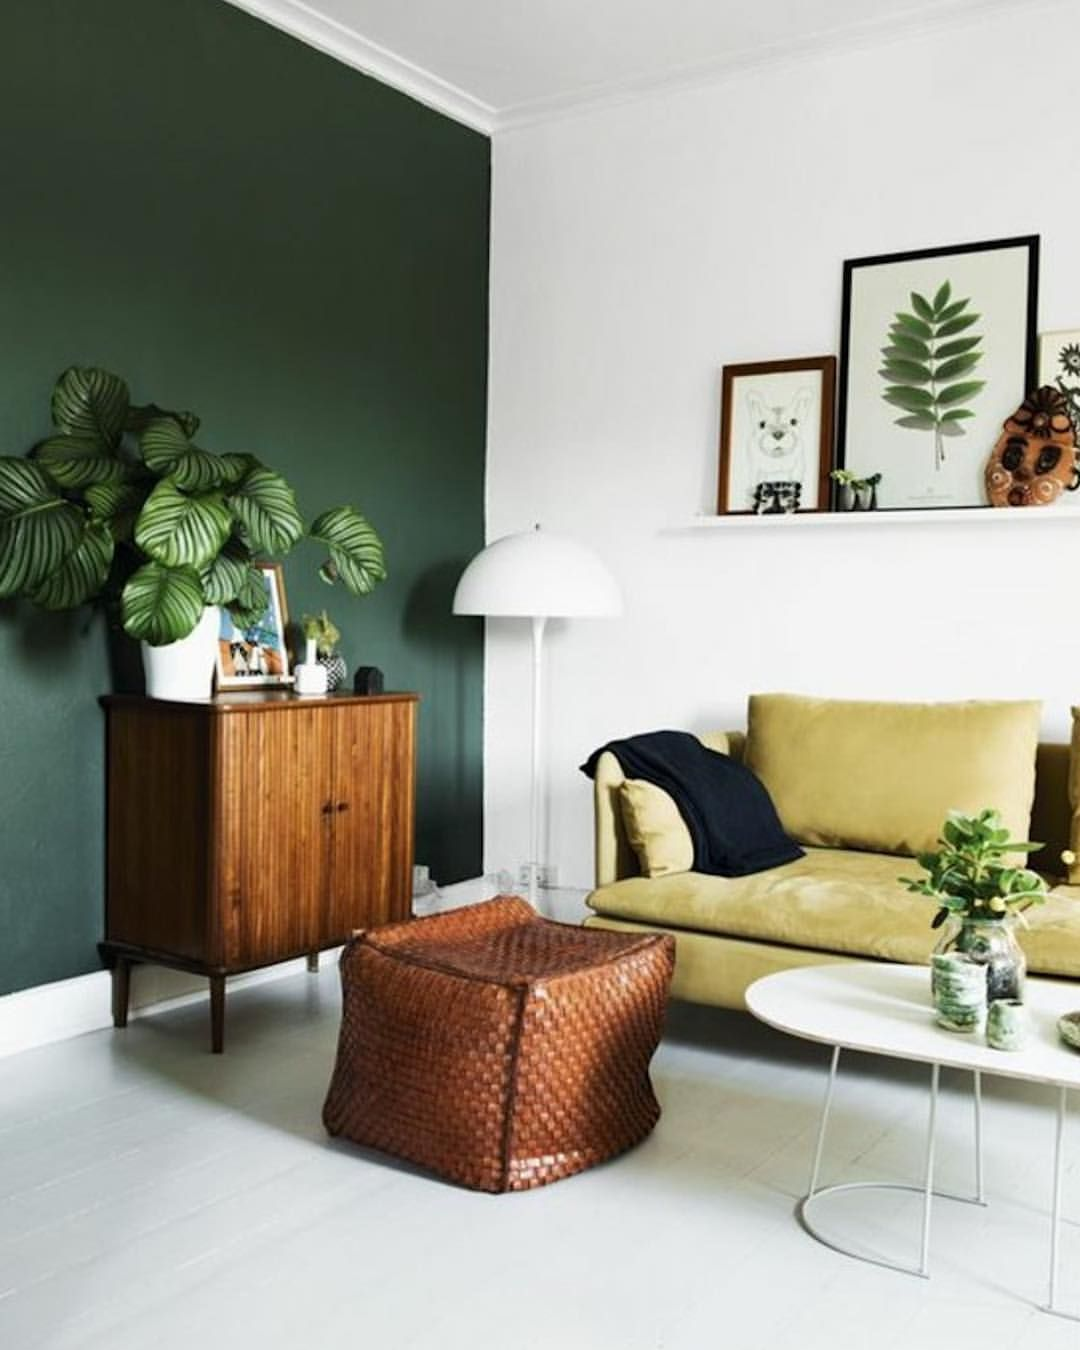 Living room green wall woonkamer groene muur | Huis inspiratie ...